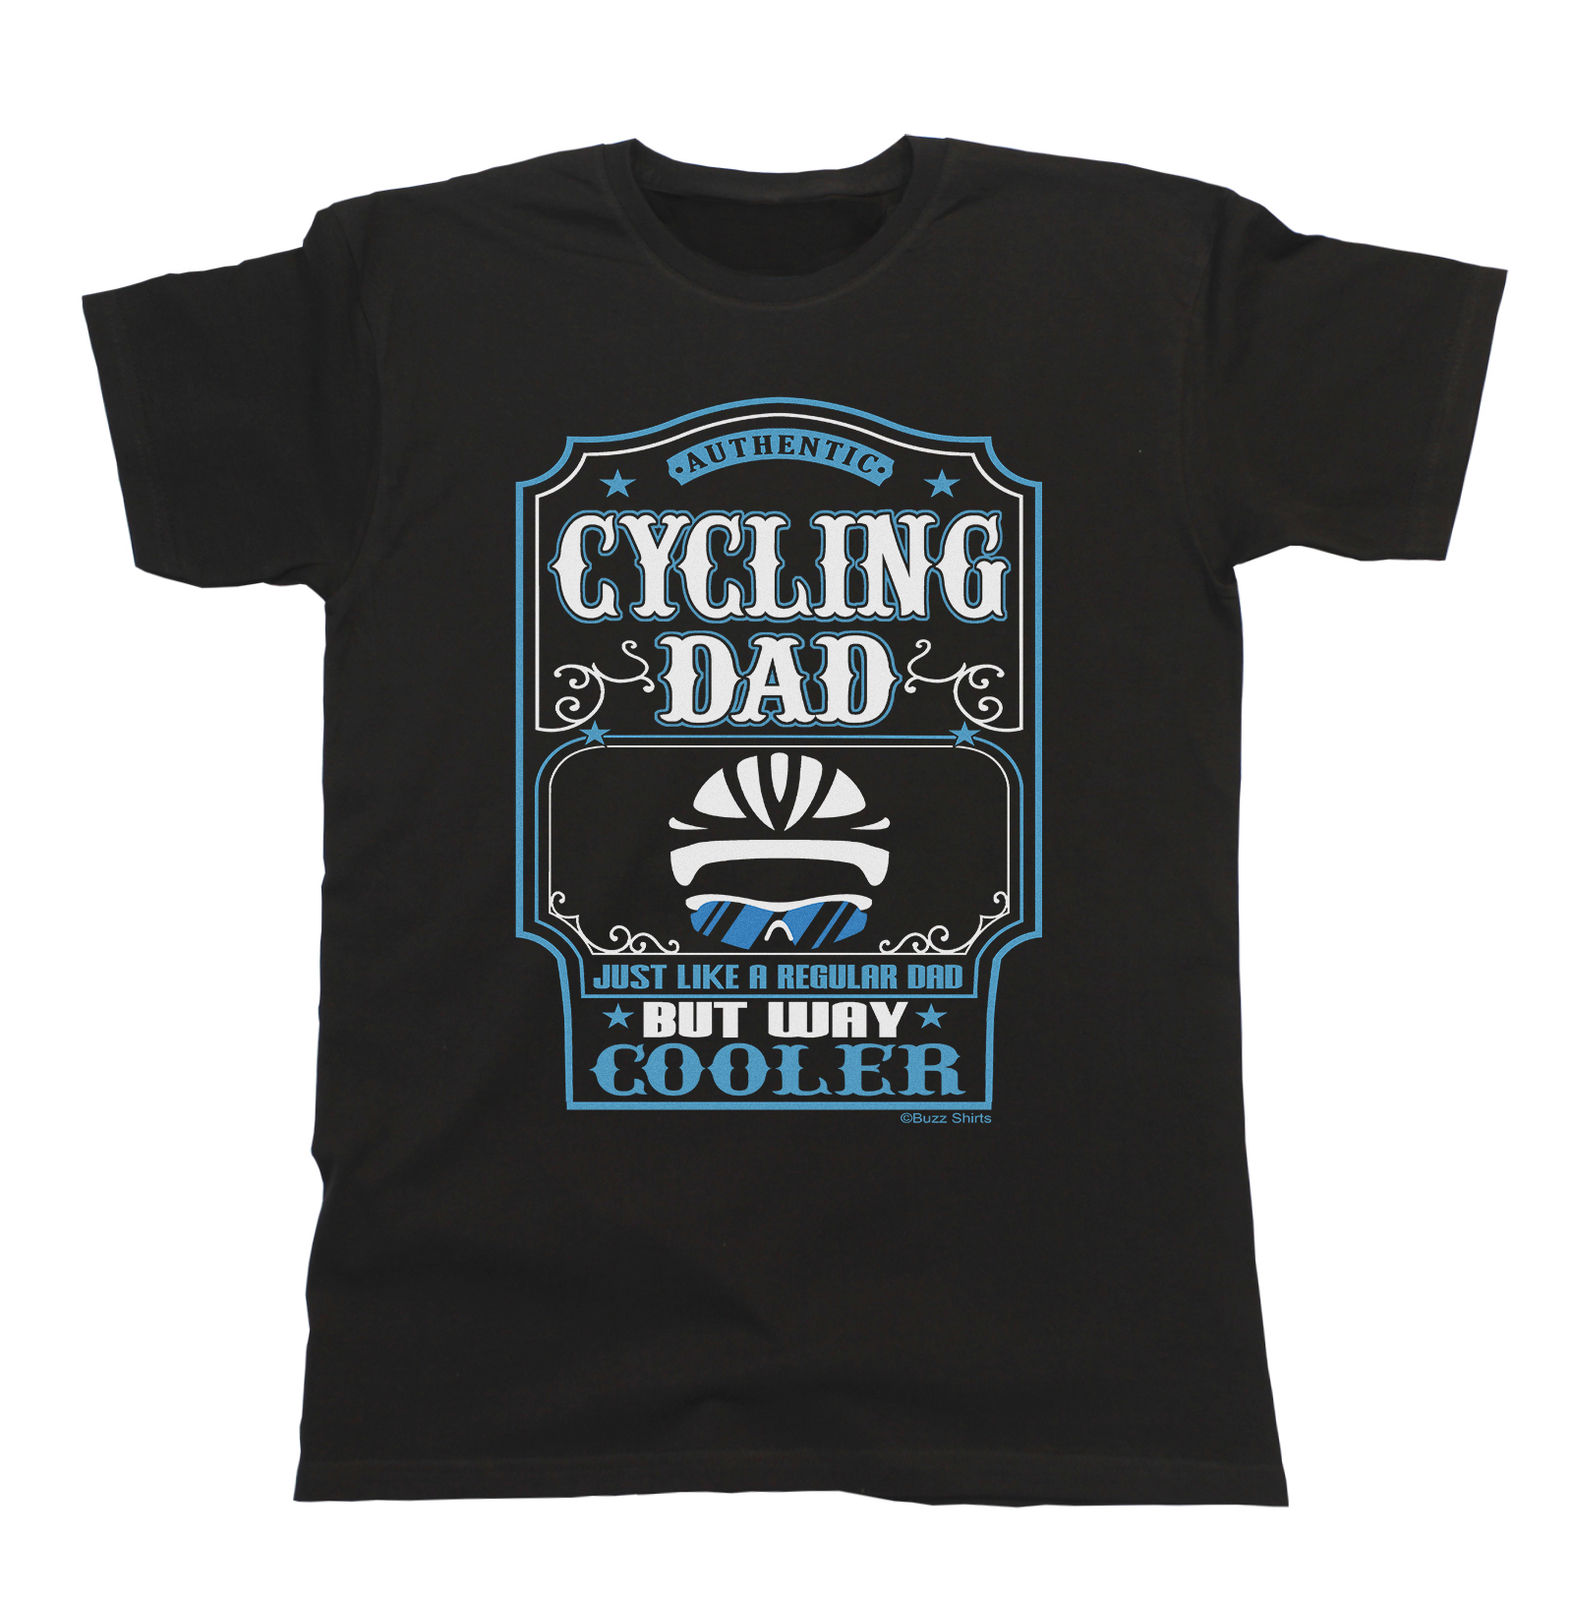 Cyclinger Dad Mens Cyclist T-Shirt Gift Birthday FATHERS Day Christmas Biker Ride Short Sleeve T Shirt Funny Print Top Tee